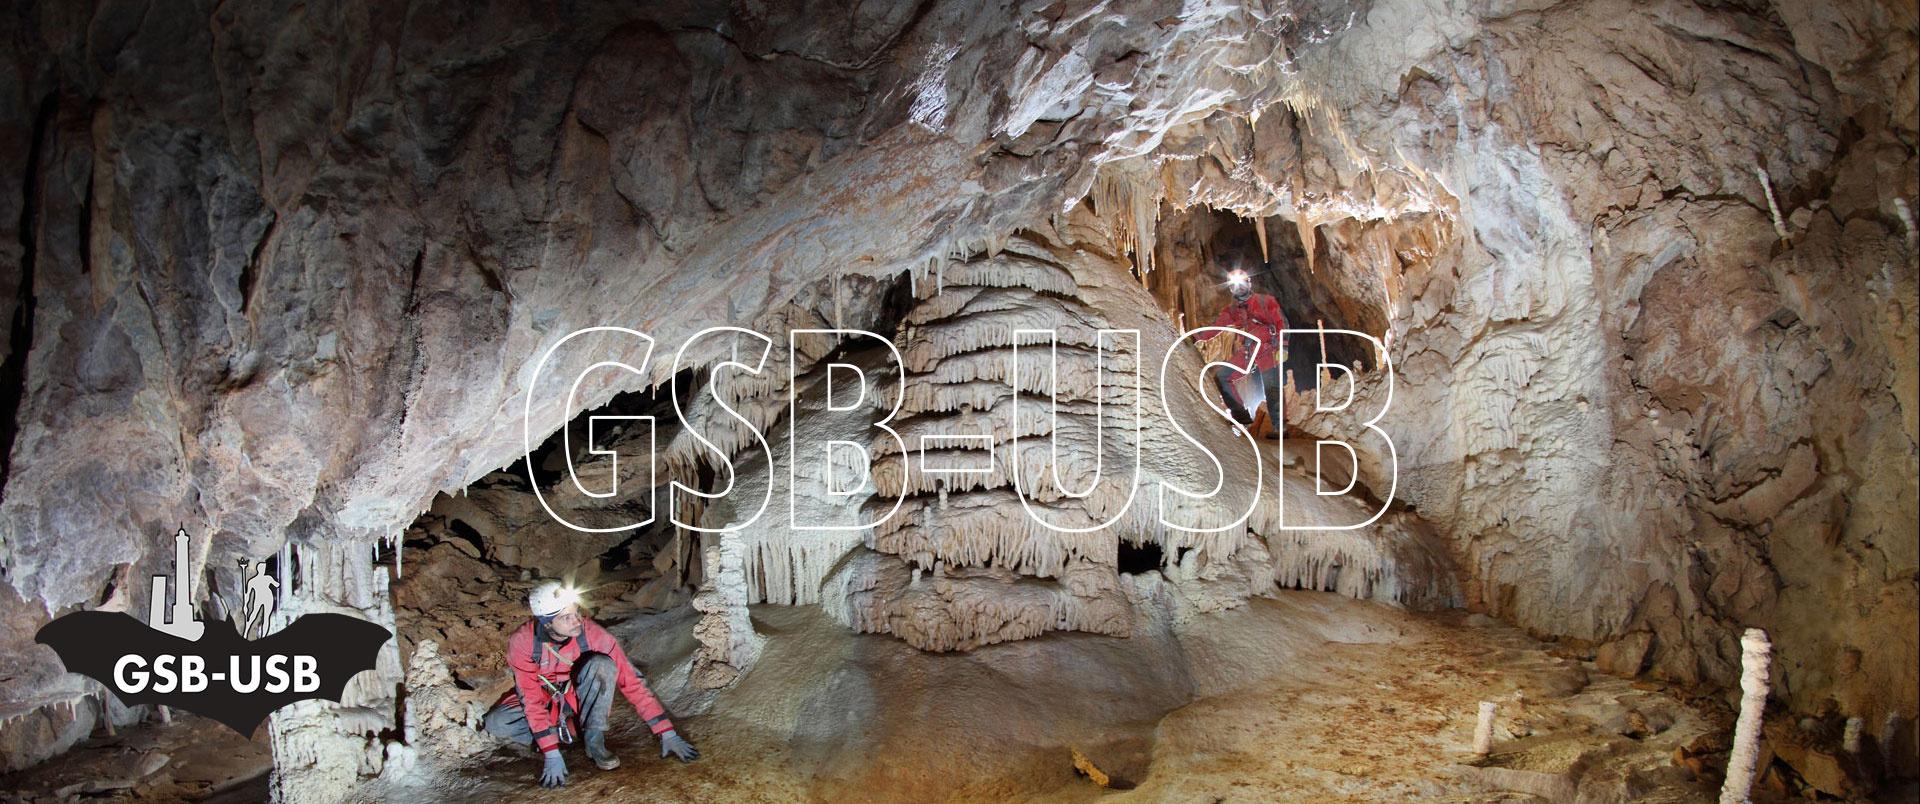 GSB-USB Scienza in grotta -